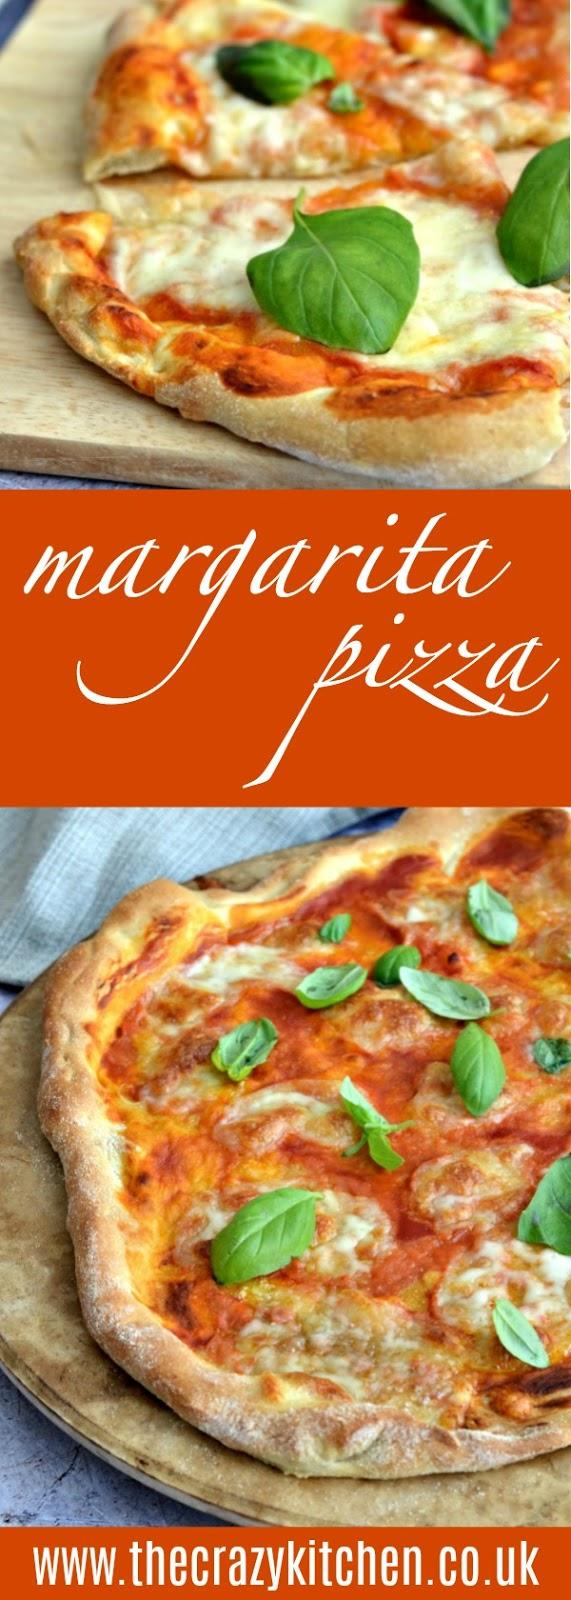 The Crazy Kitchen Classic Thin Crispy Margarita Pizza